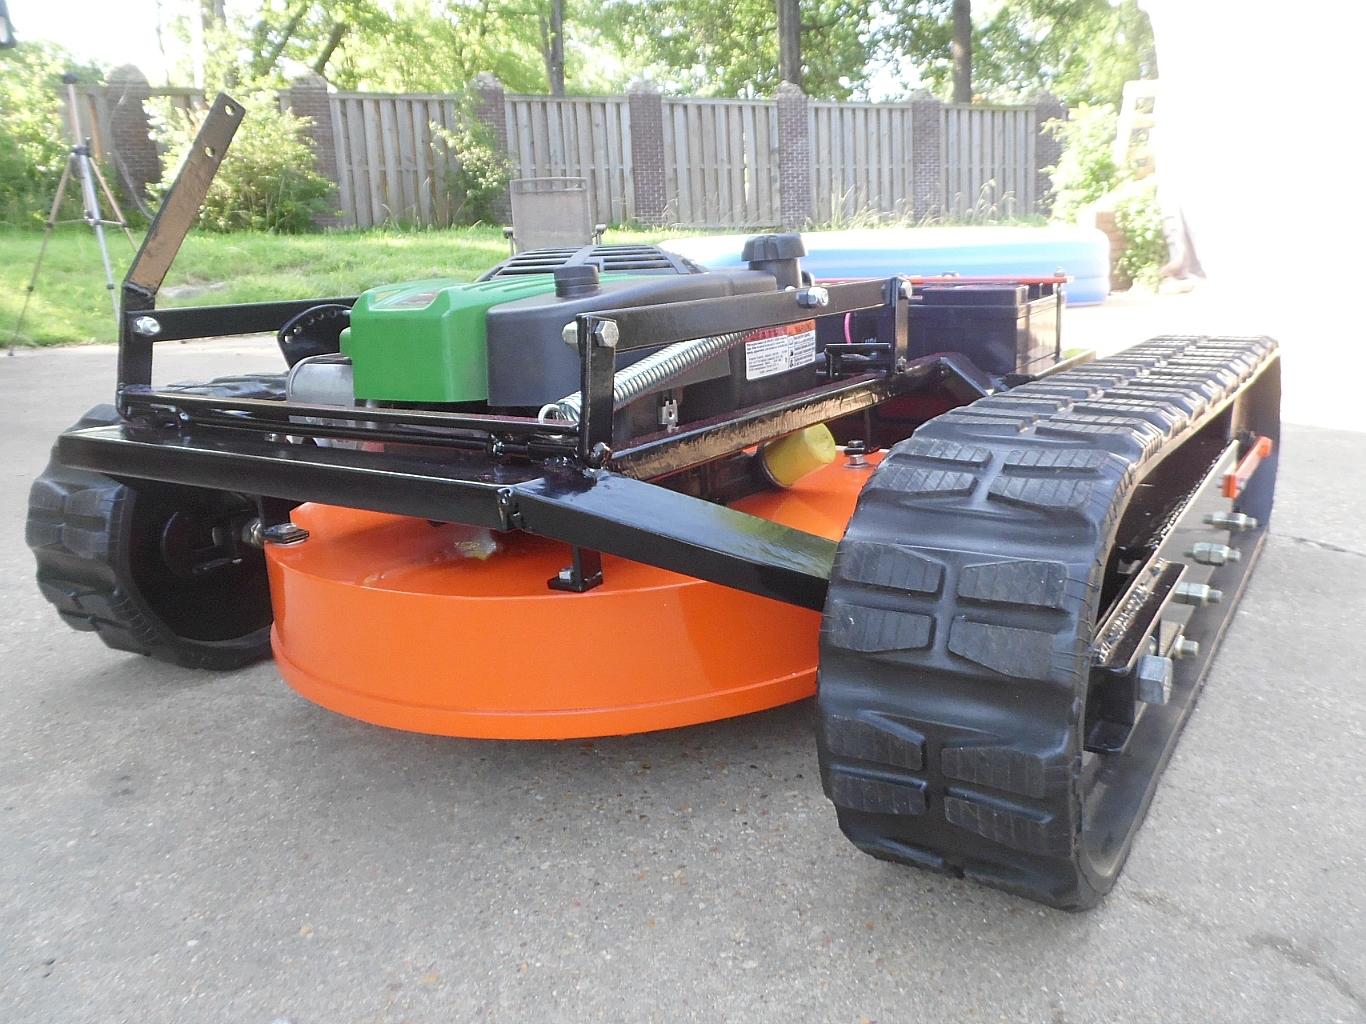 Are Robotic Lawn Mowers The Future